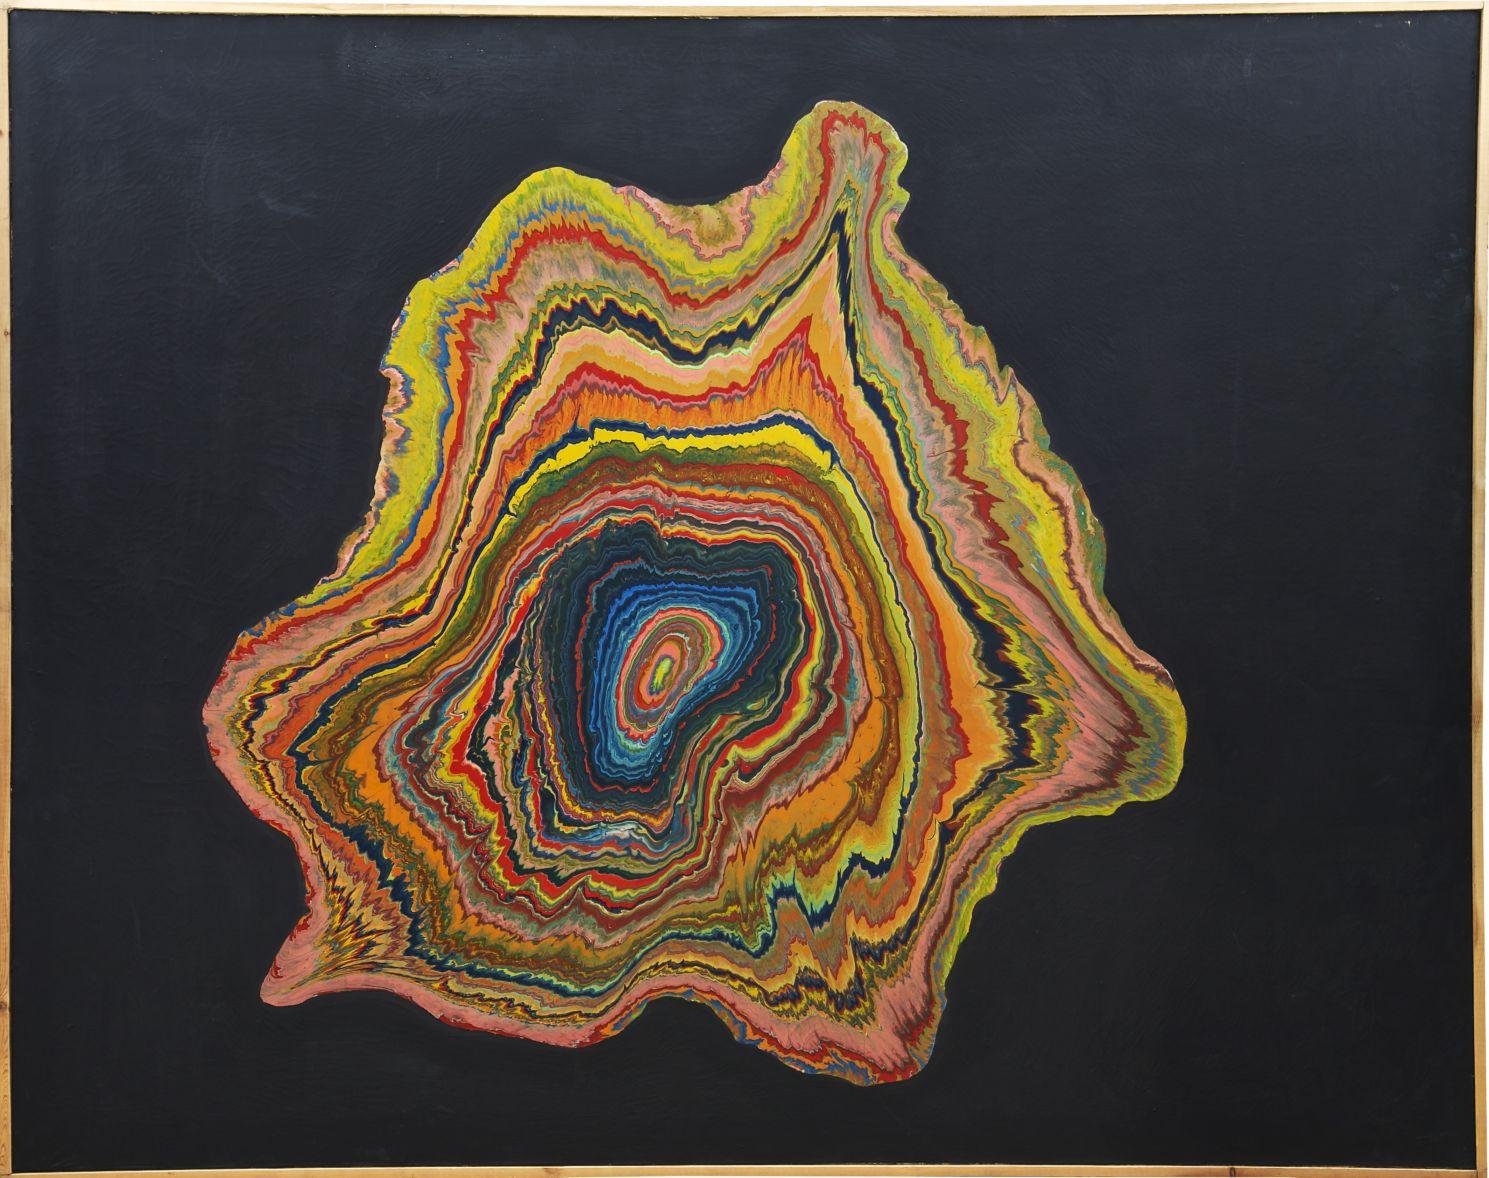 Black Whirpool, 1965, Shozo Shimamoto